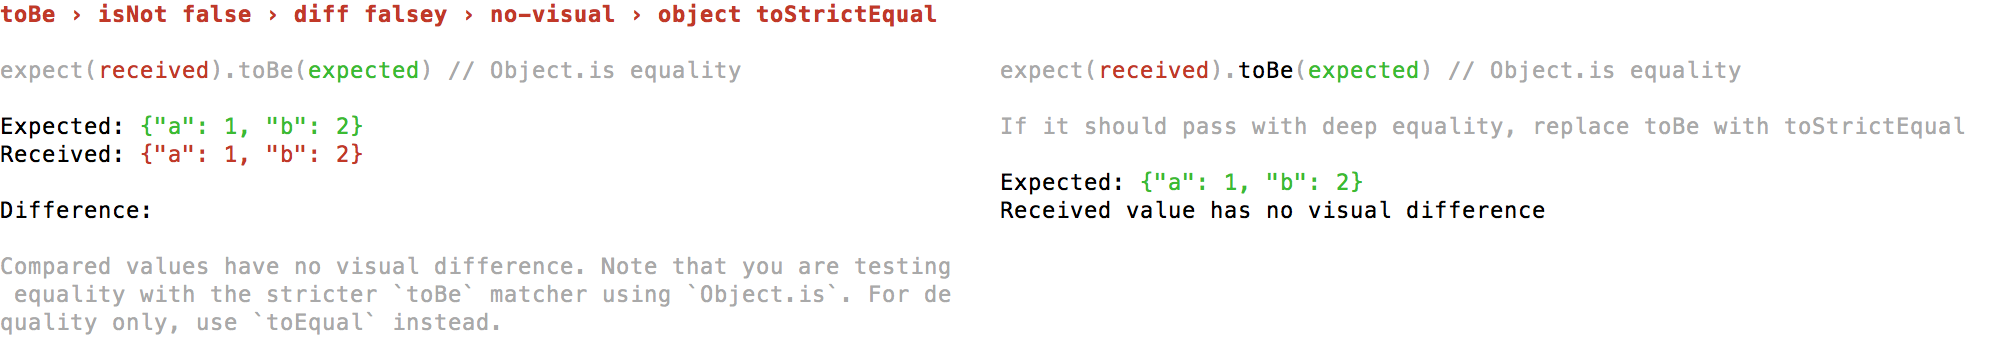 false falsey no-visual object toStrictEqual 2